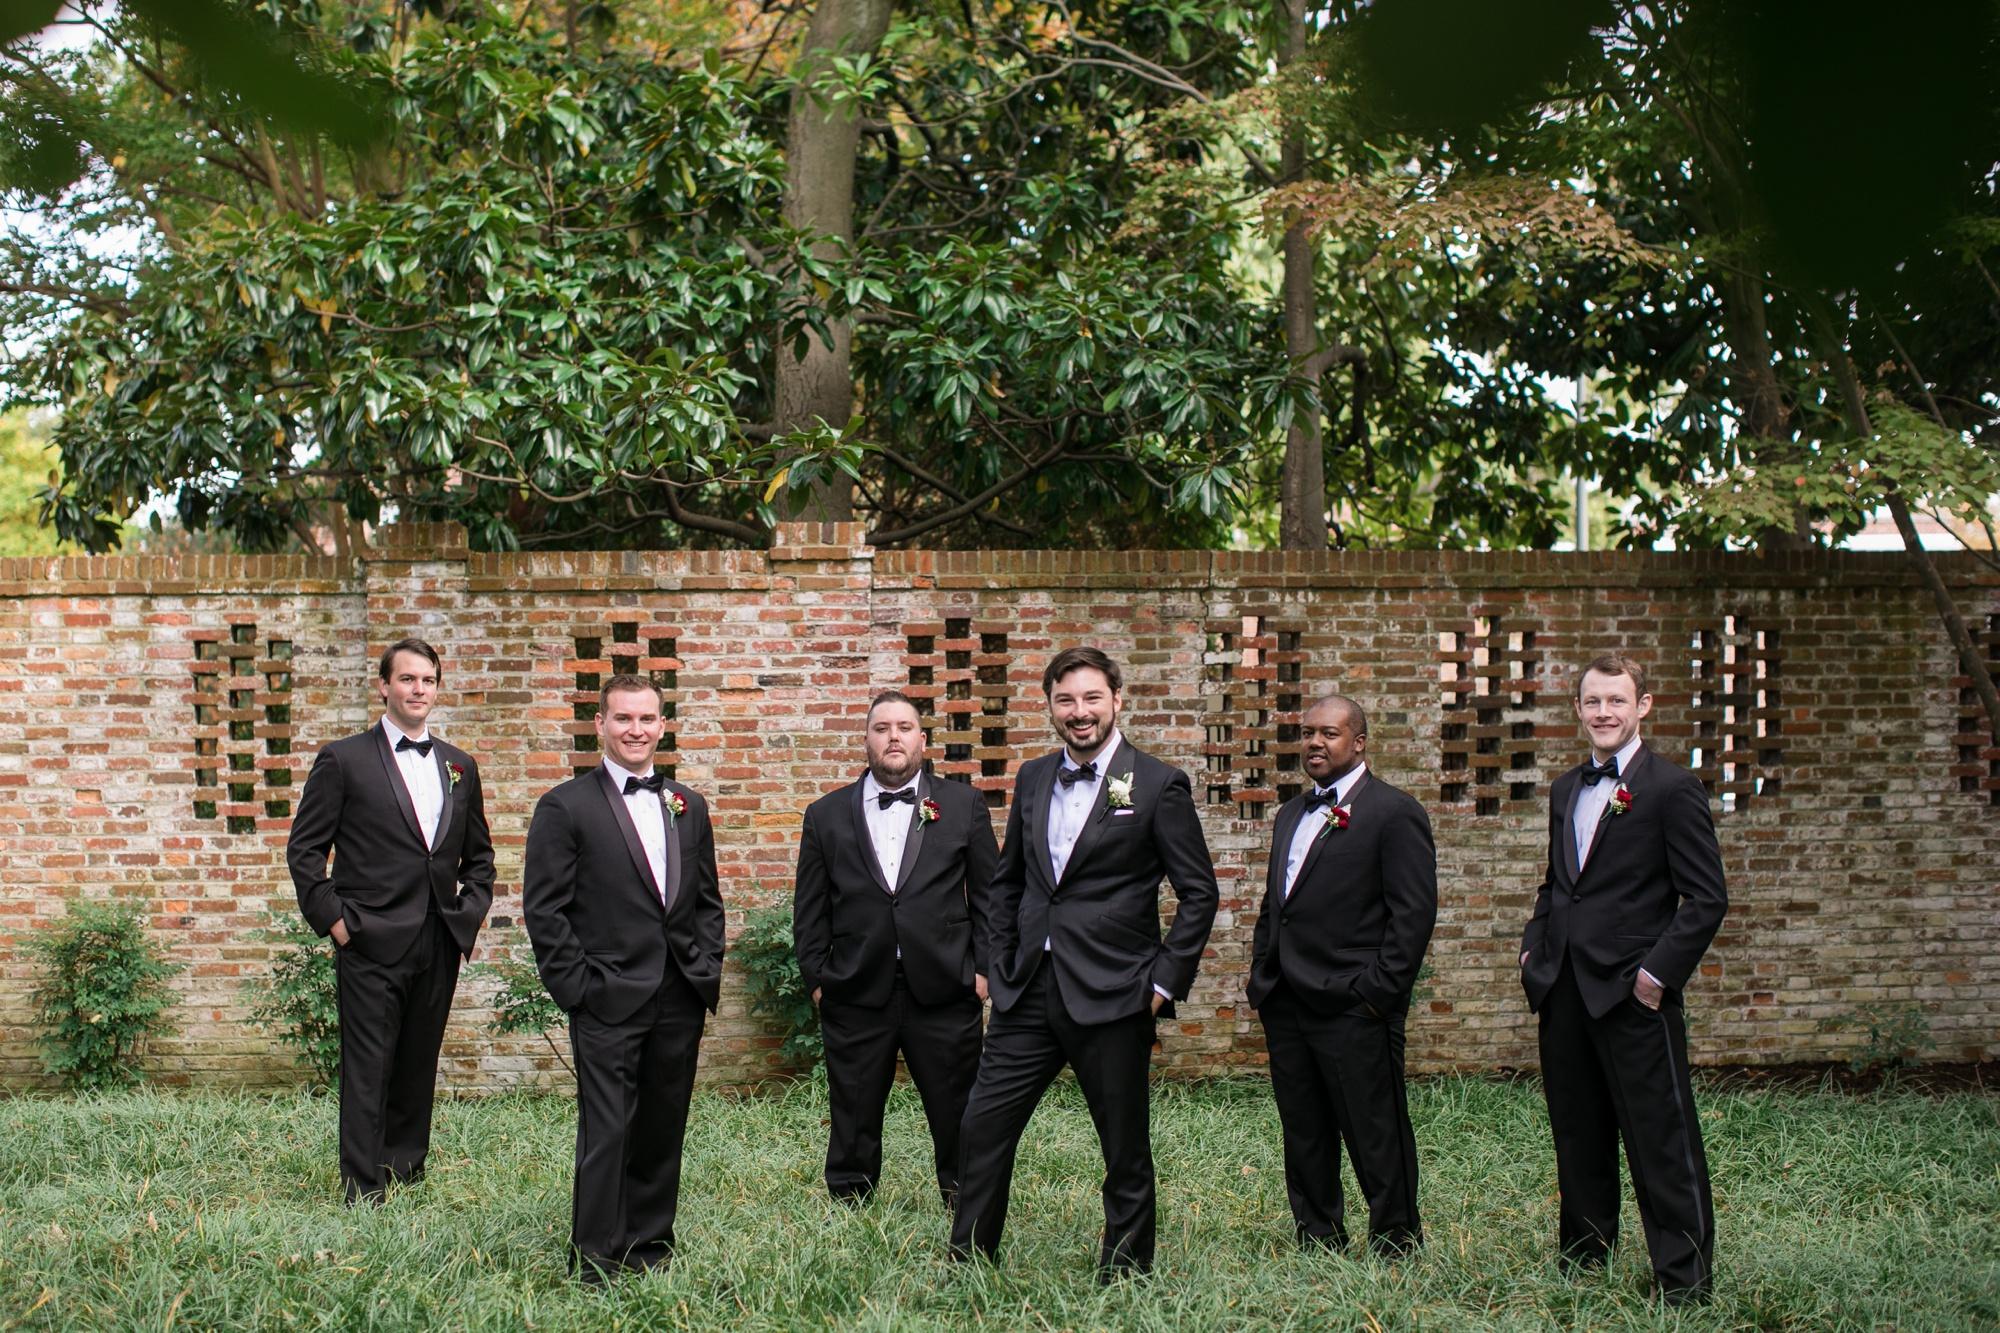 The Tidewater inn groomsmen photo